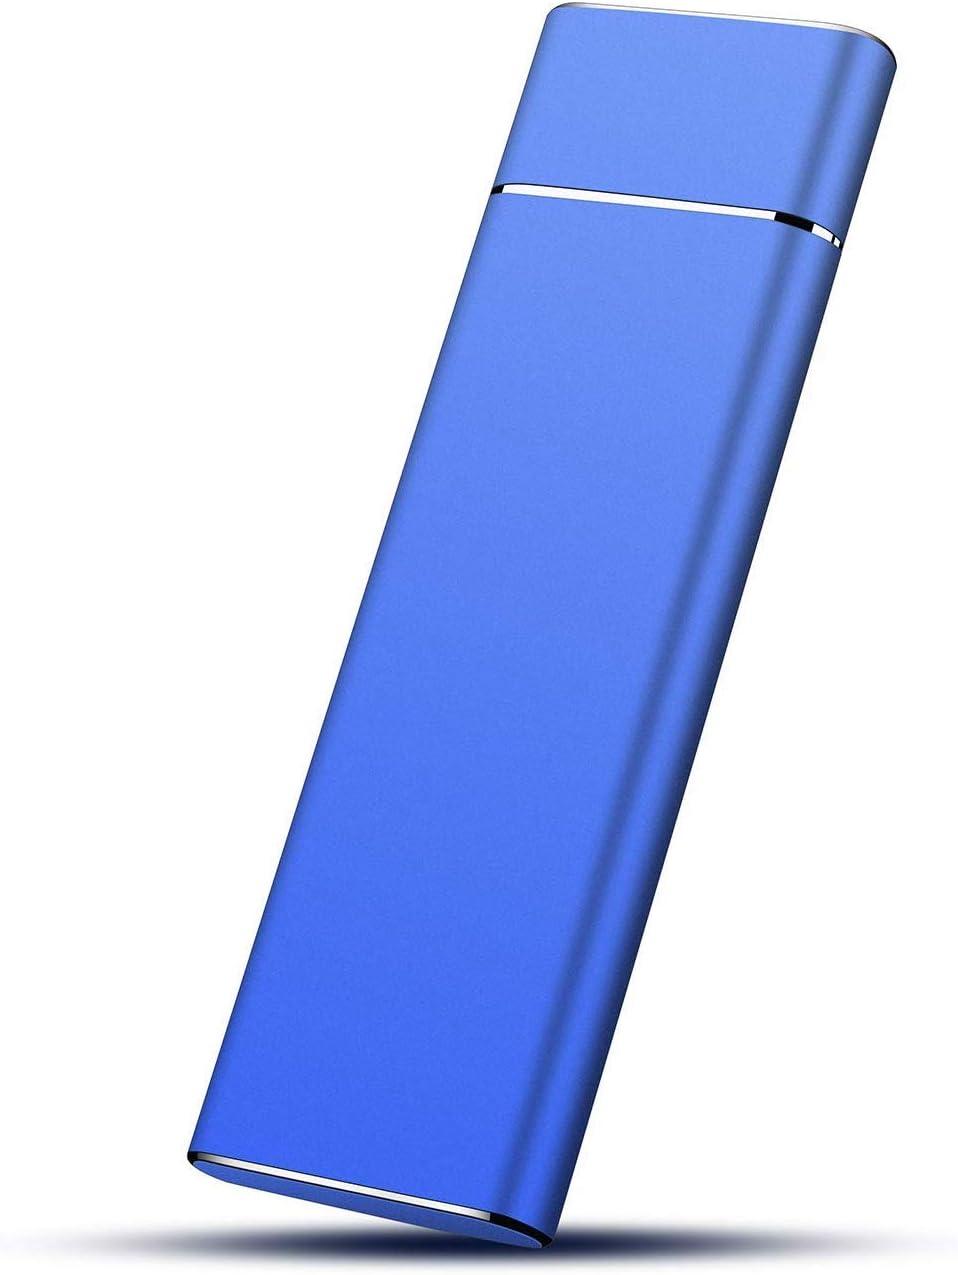 External Hard Drive 1TB 2TB, Portable Hard Drive External USB 3.1/Type-C Slim Hard Drive Data Storage Compatible with PC, Laptop and Mac (2TB-Blue)